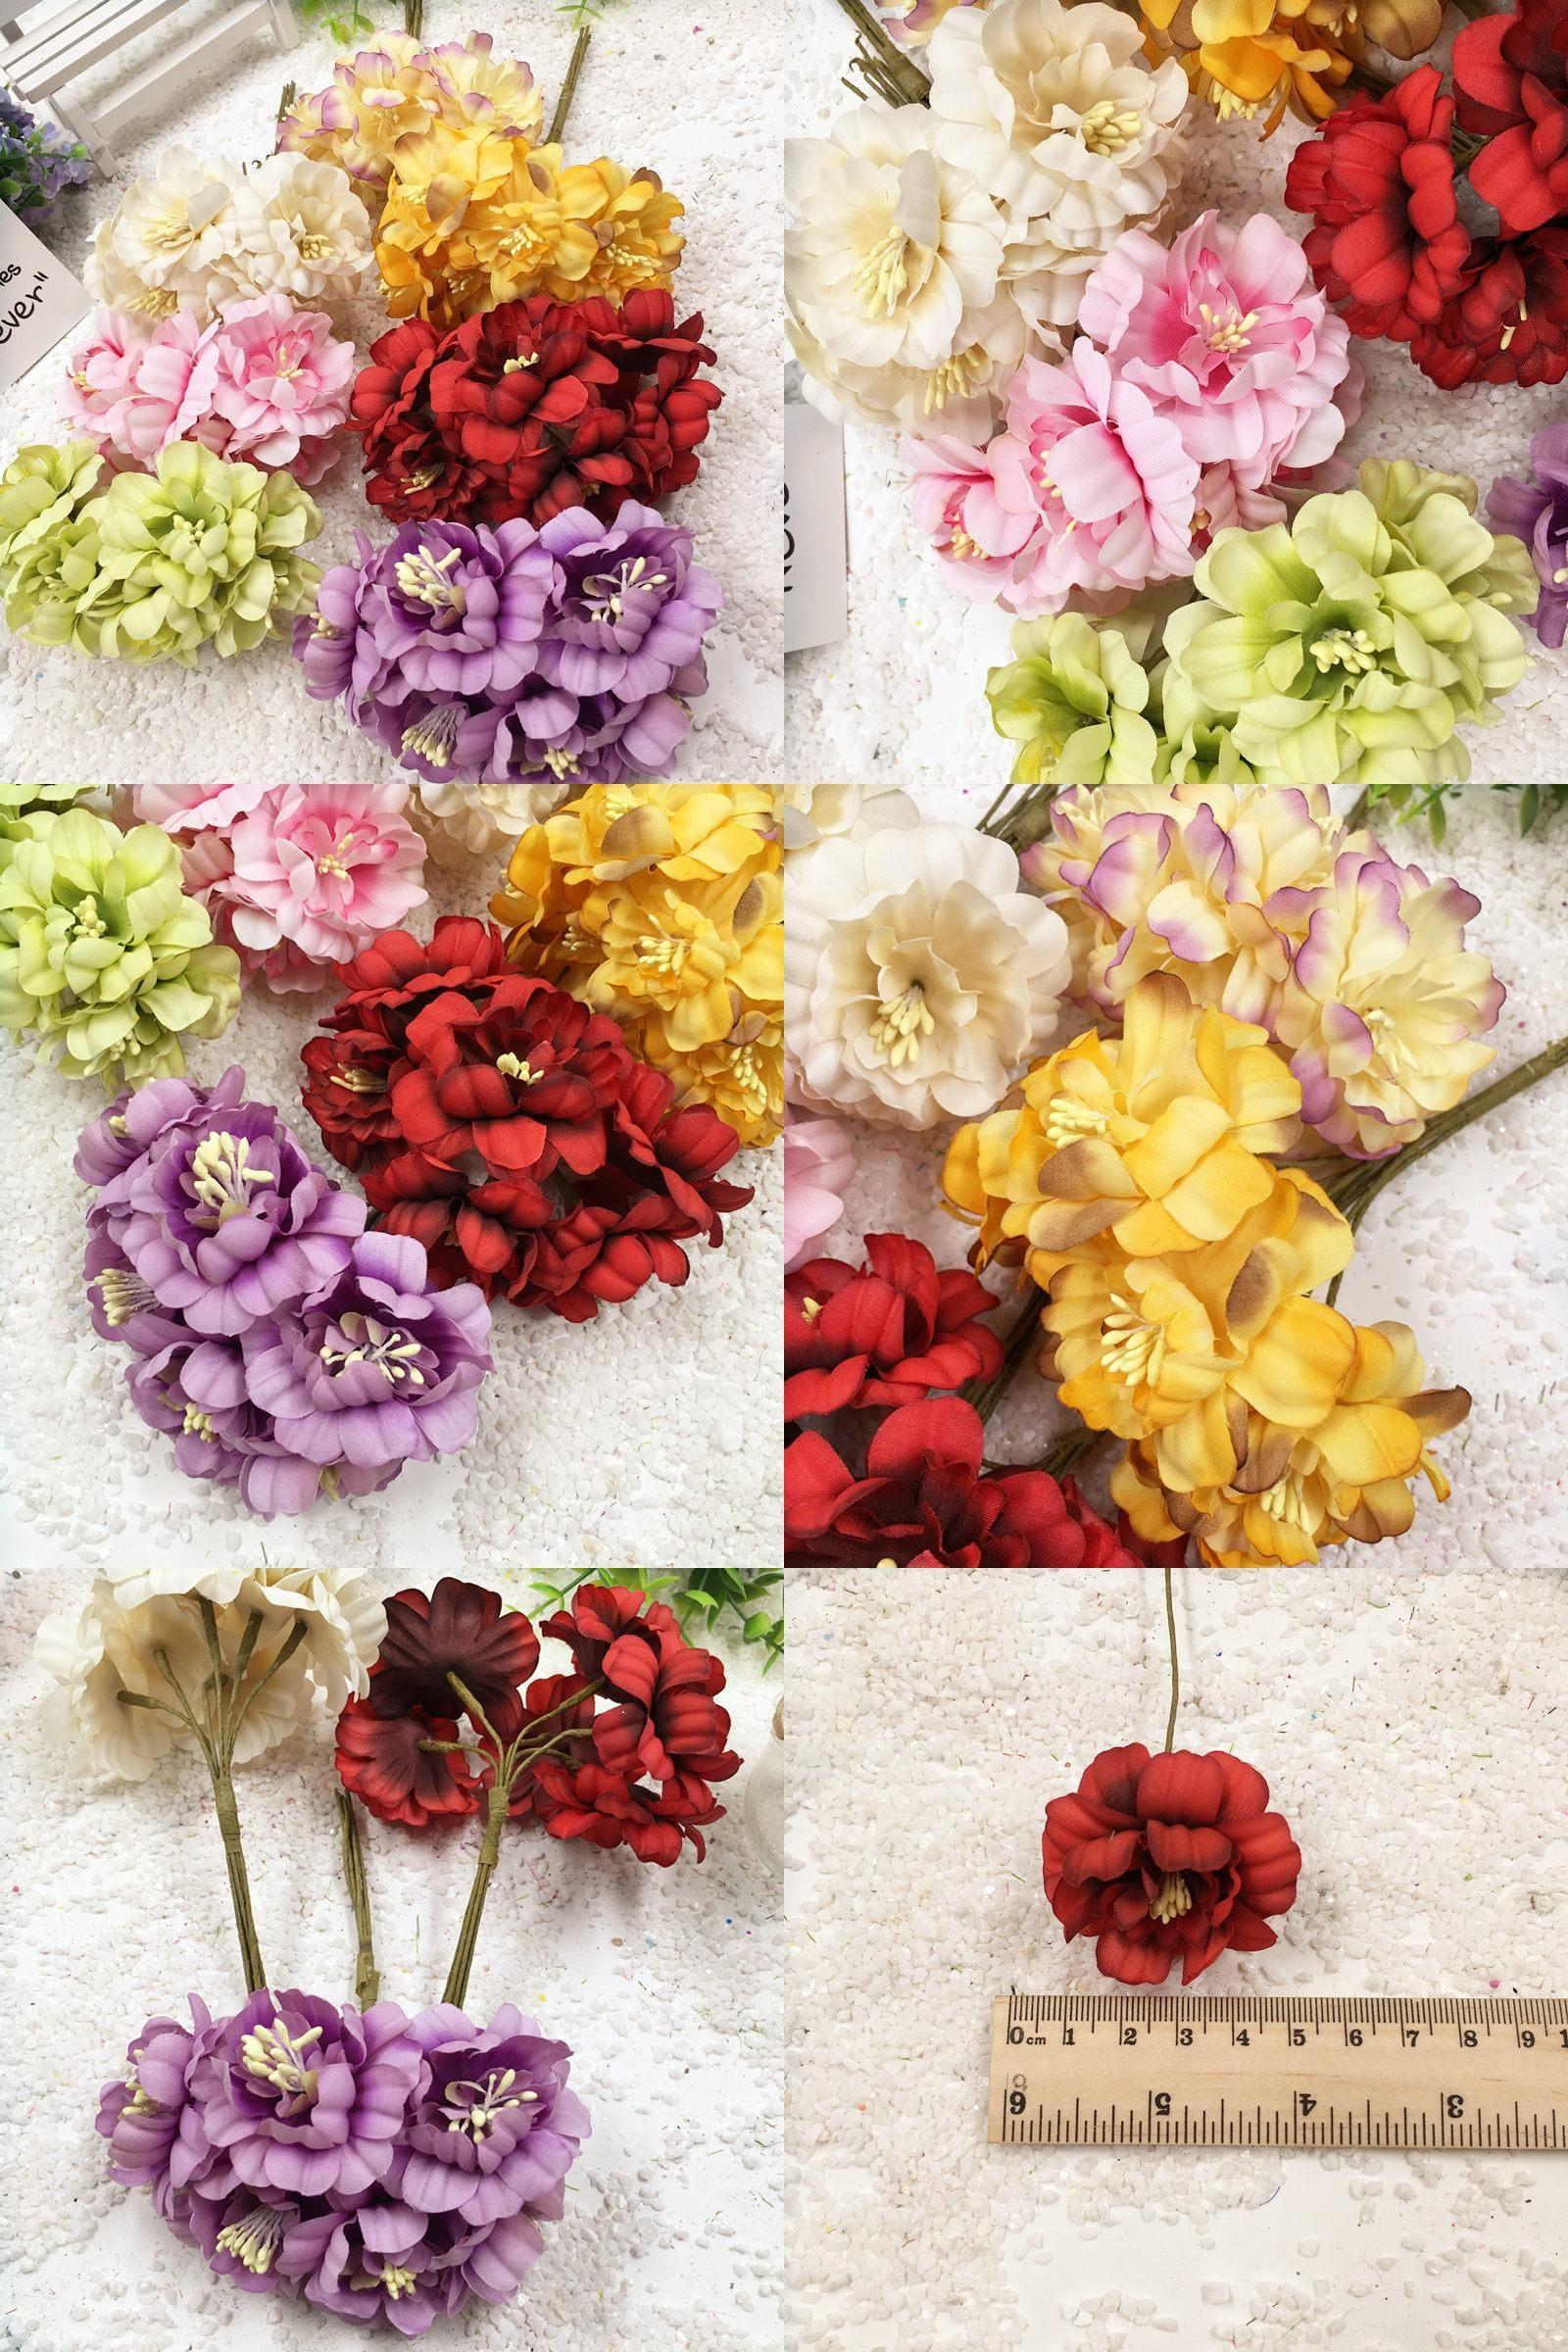 Visit To Buy 6 Pcs 45 Cm Artificial Silk Cloth Daisy Flower